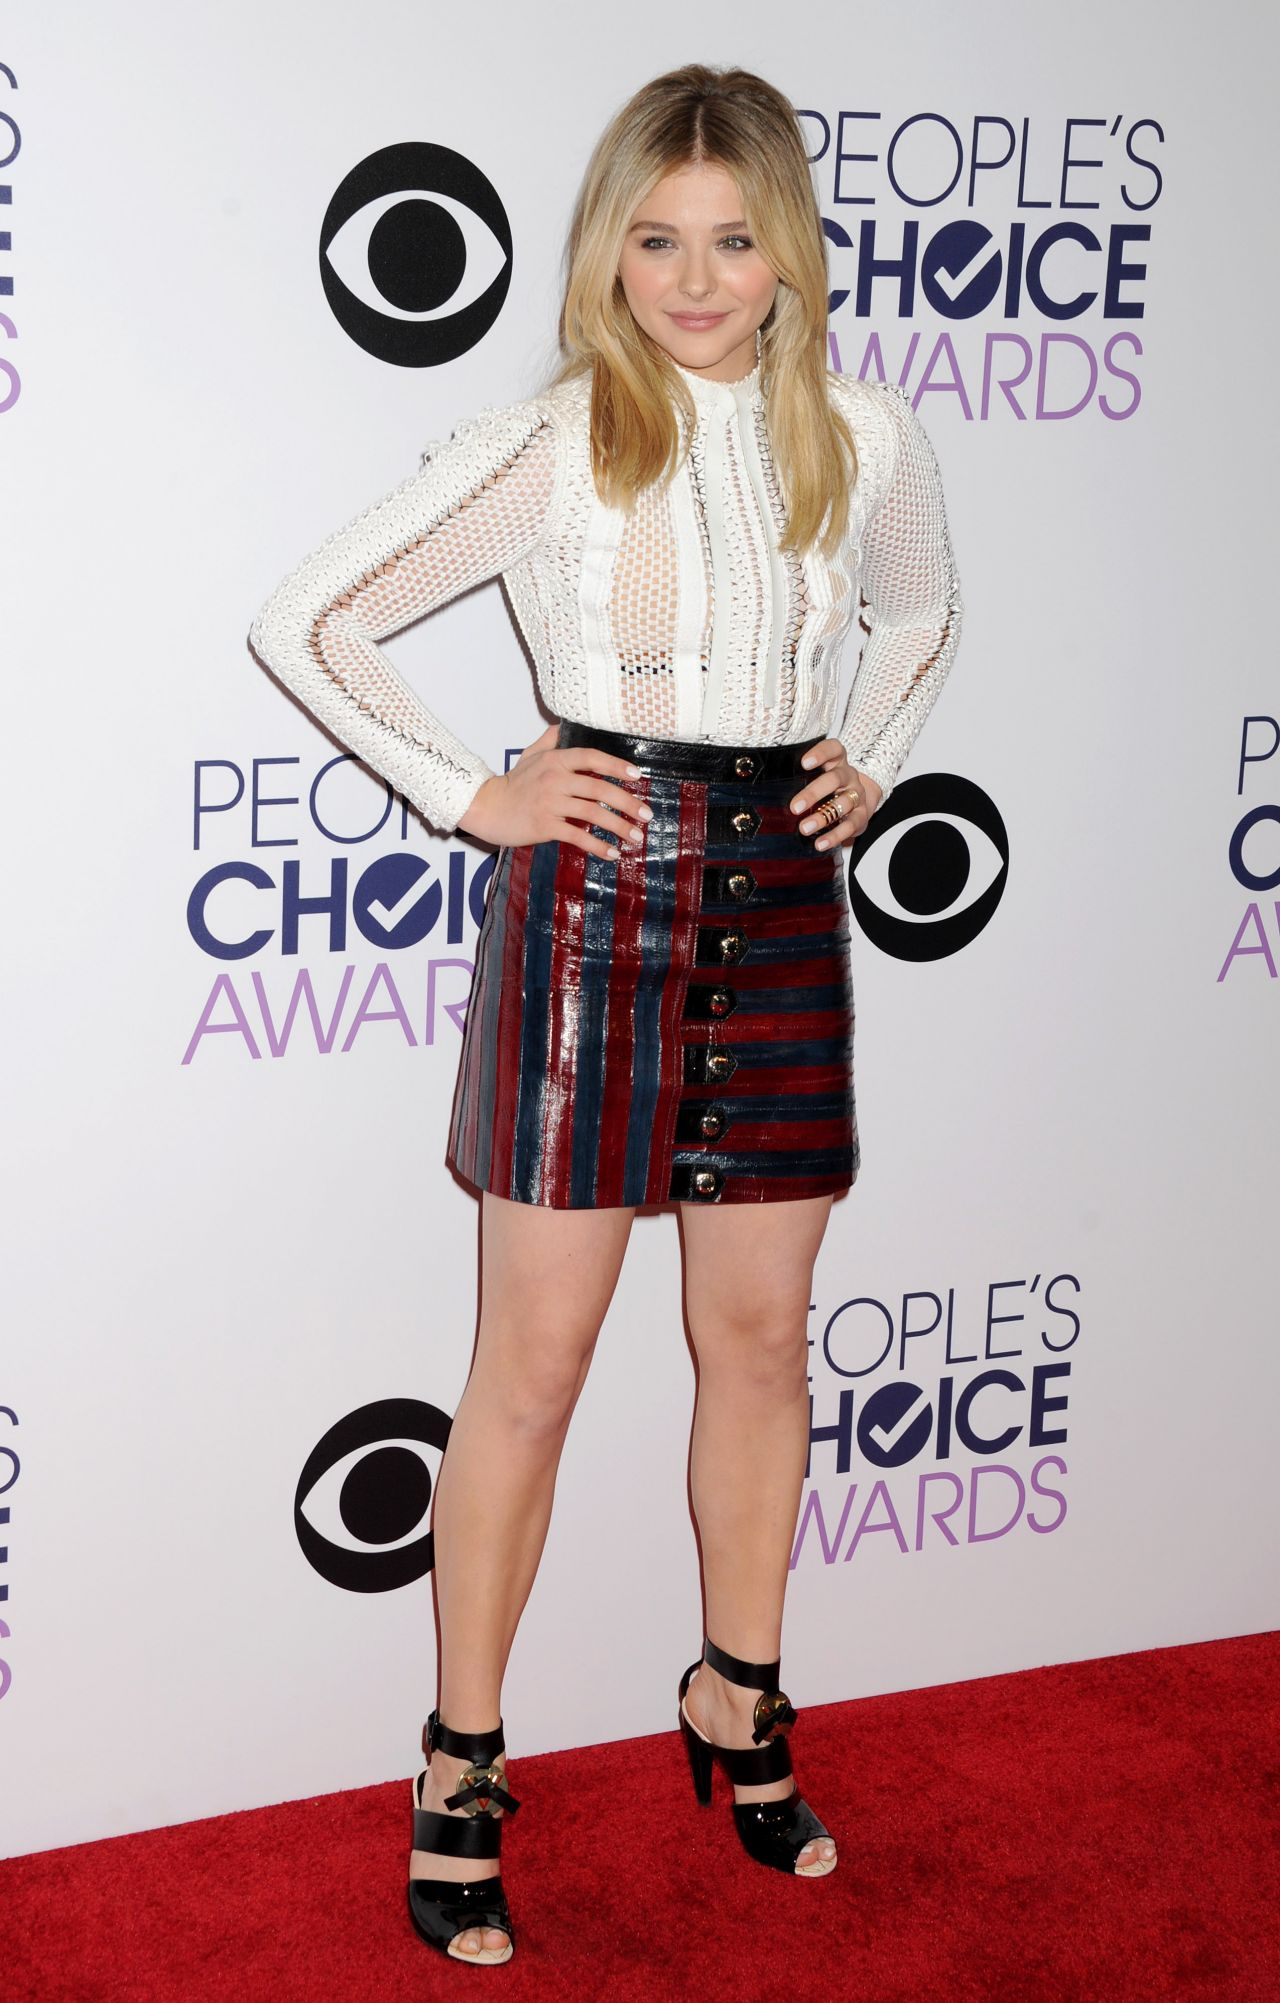 Chloe Grace Moretz la rubia mas hermosa de todas [Imagenes]